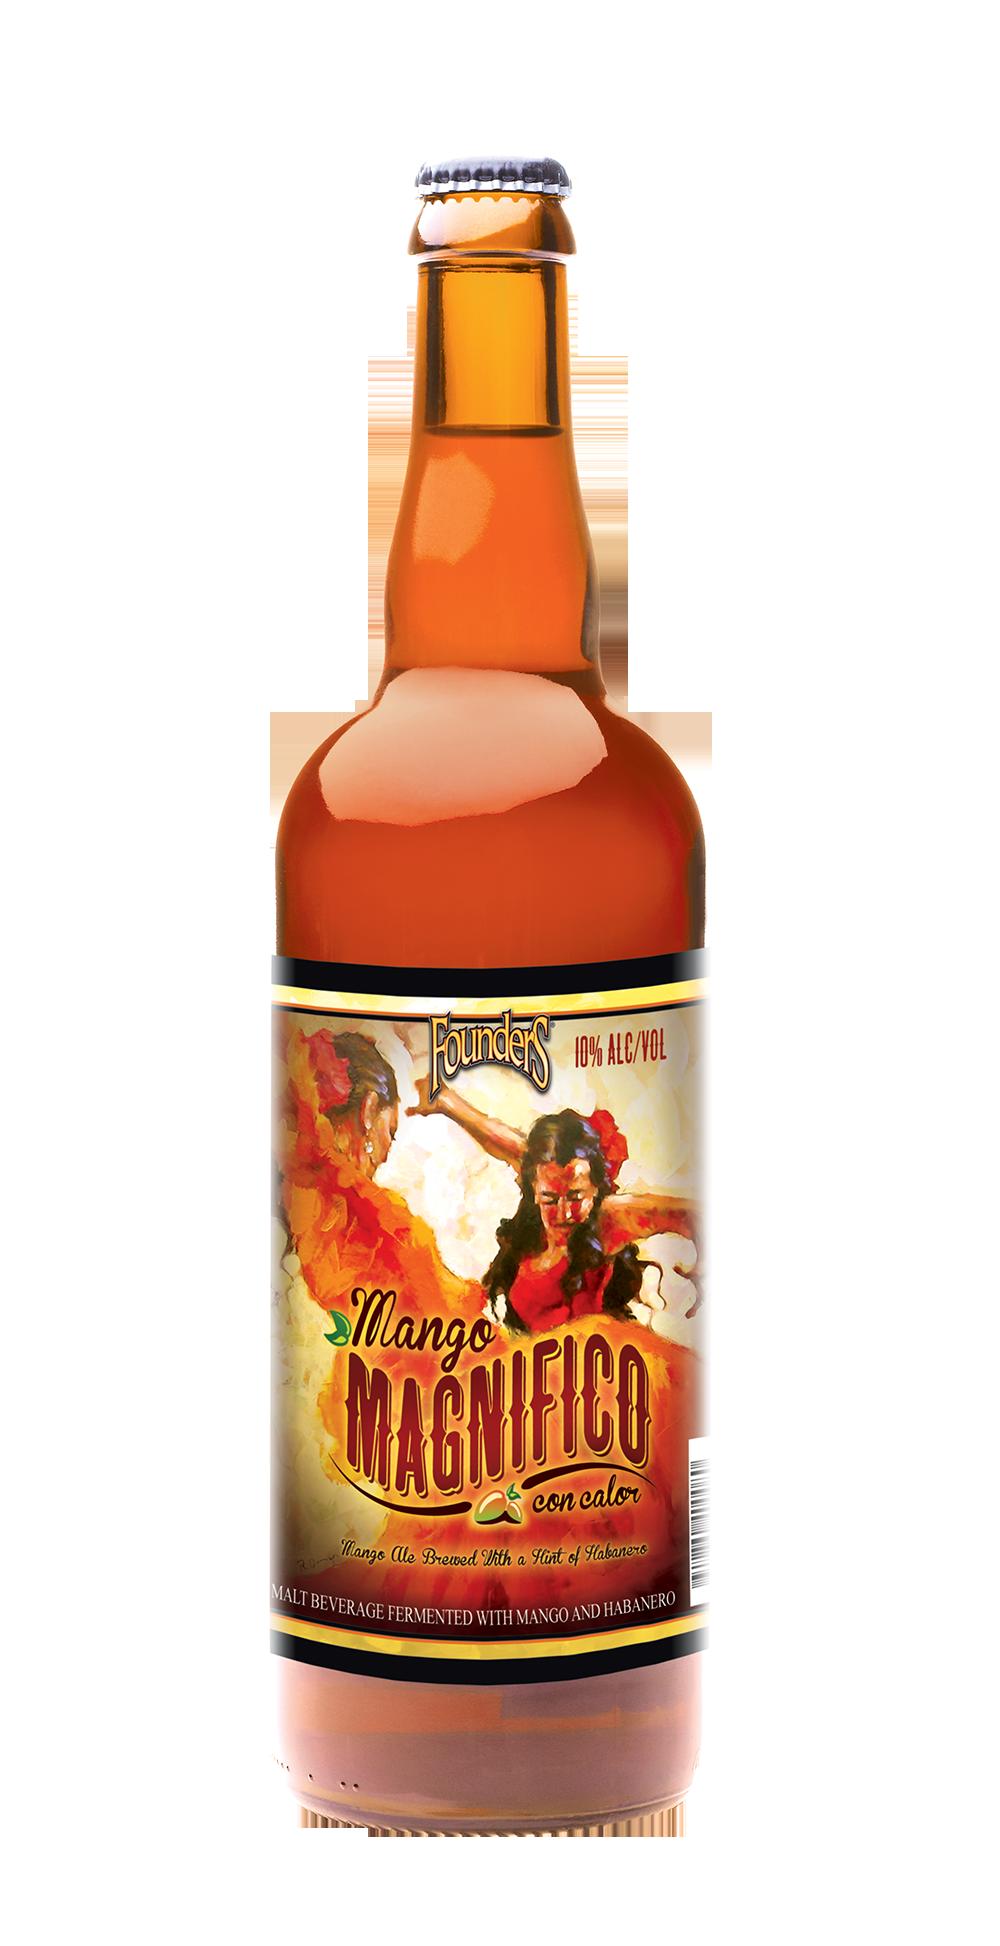 Mango Magnifico - Pivoblog, Minden ami sör